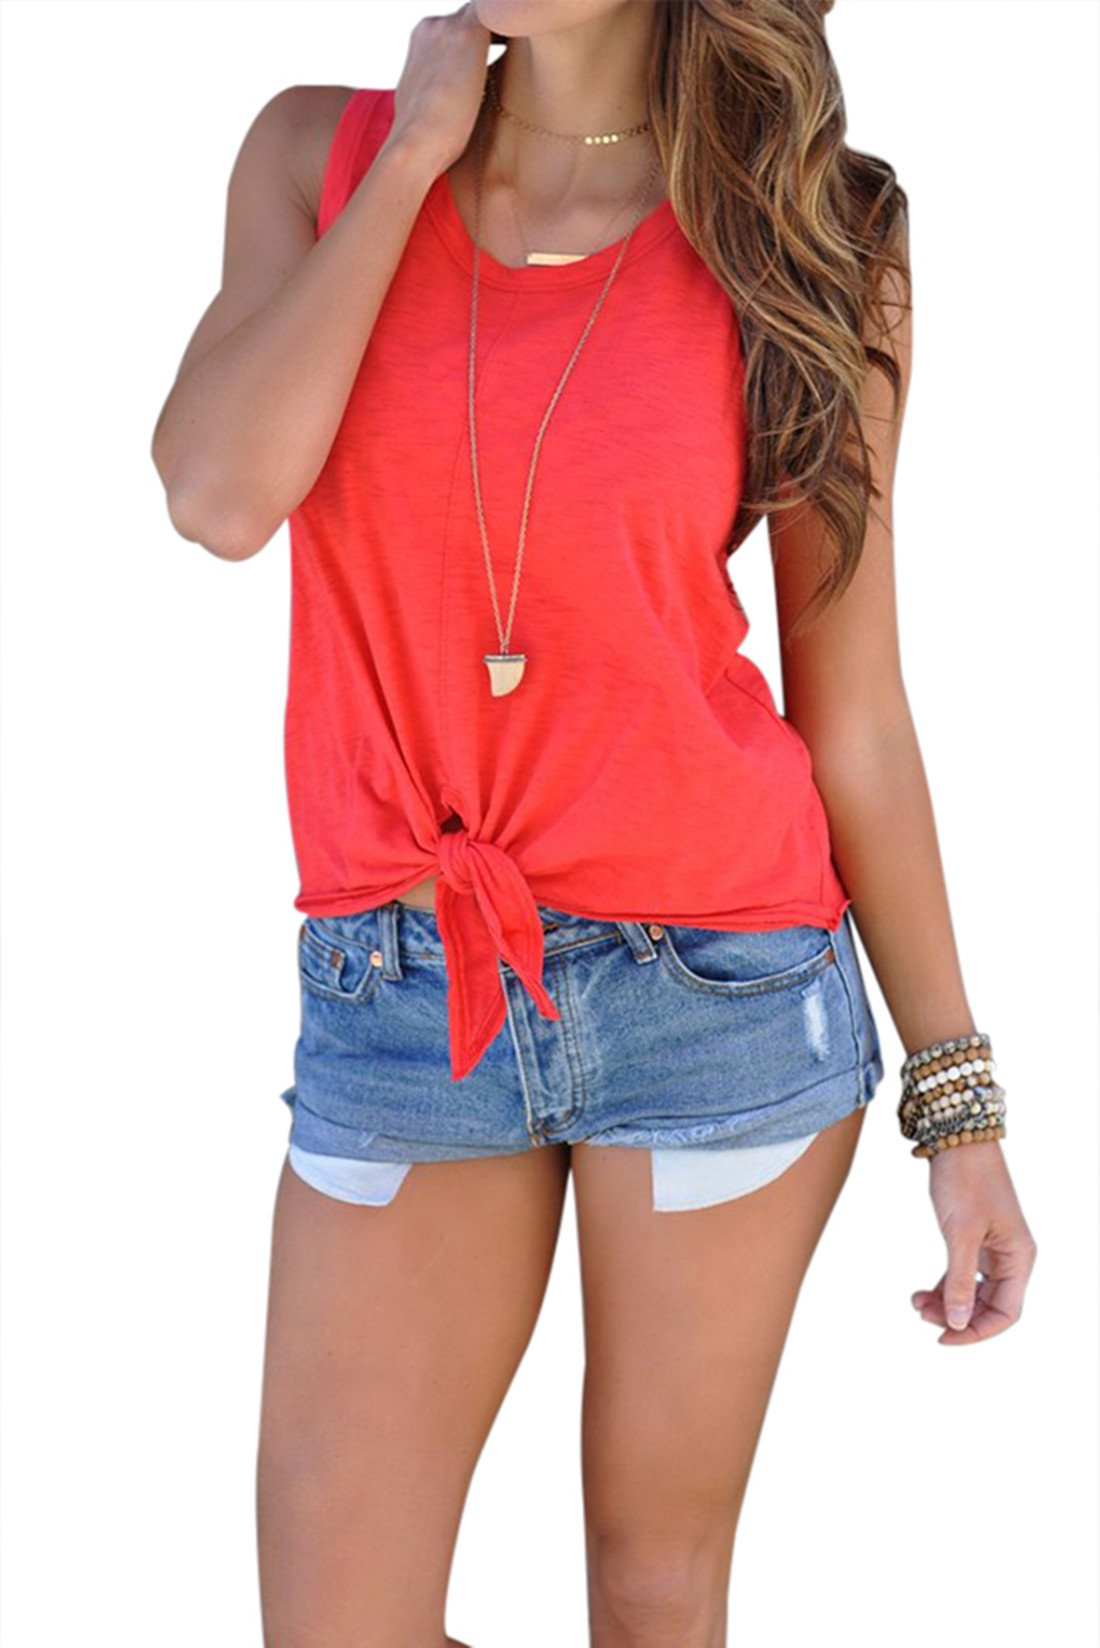 Astylish Women's Sleeveless Shirt Summer Blouse Tie Front Casual Tank Tops Red Medium 8 10